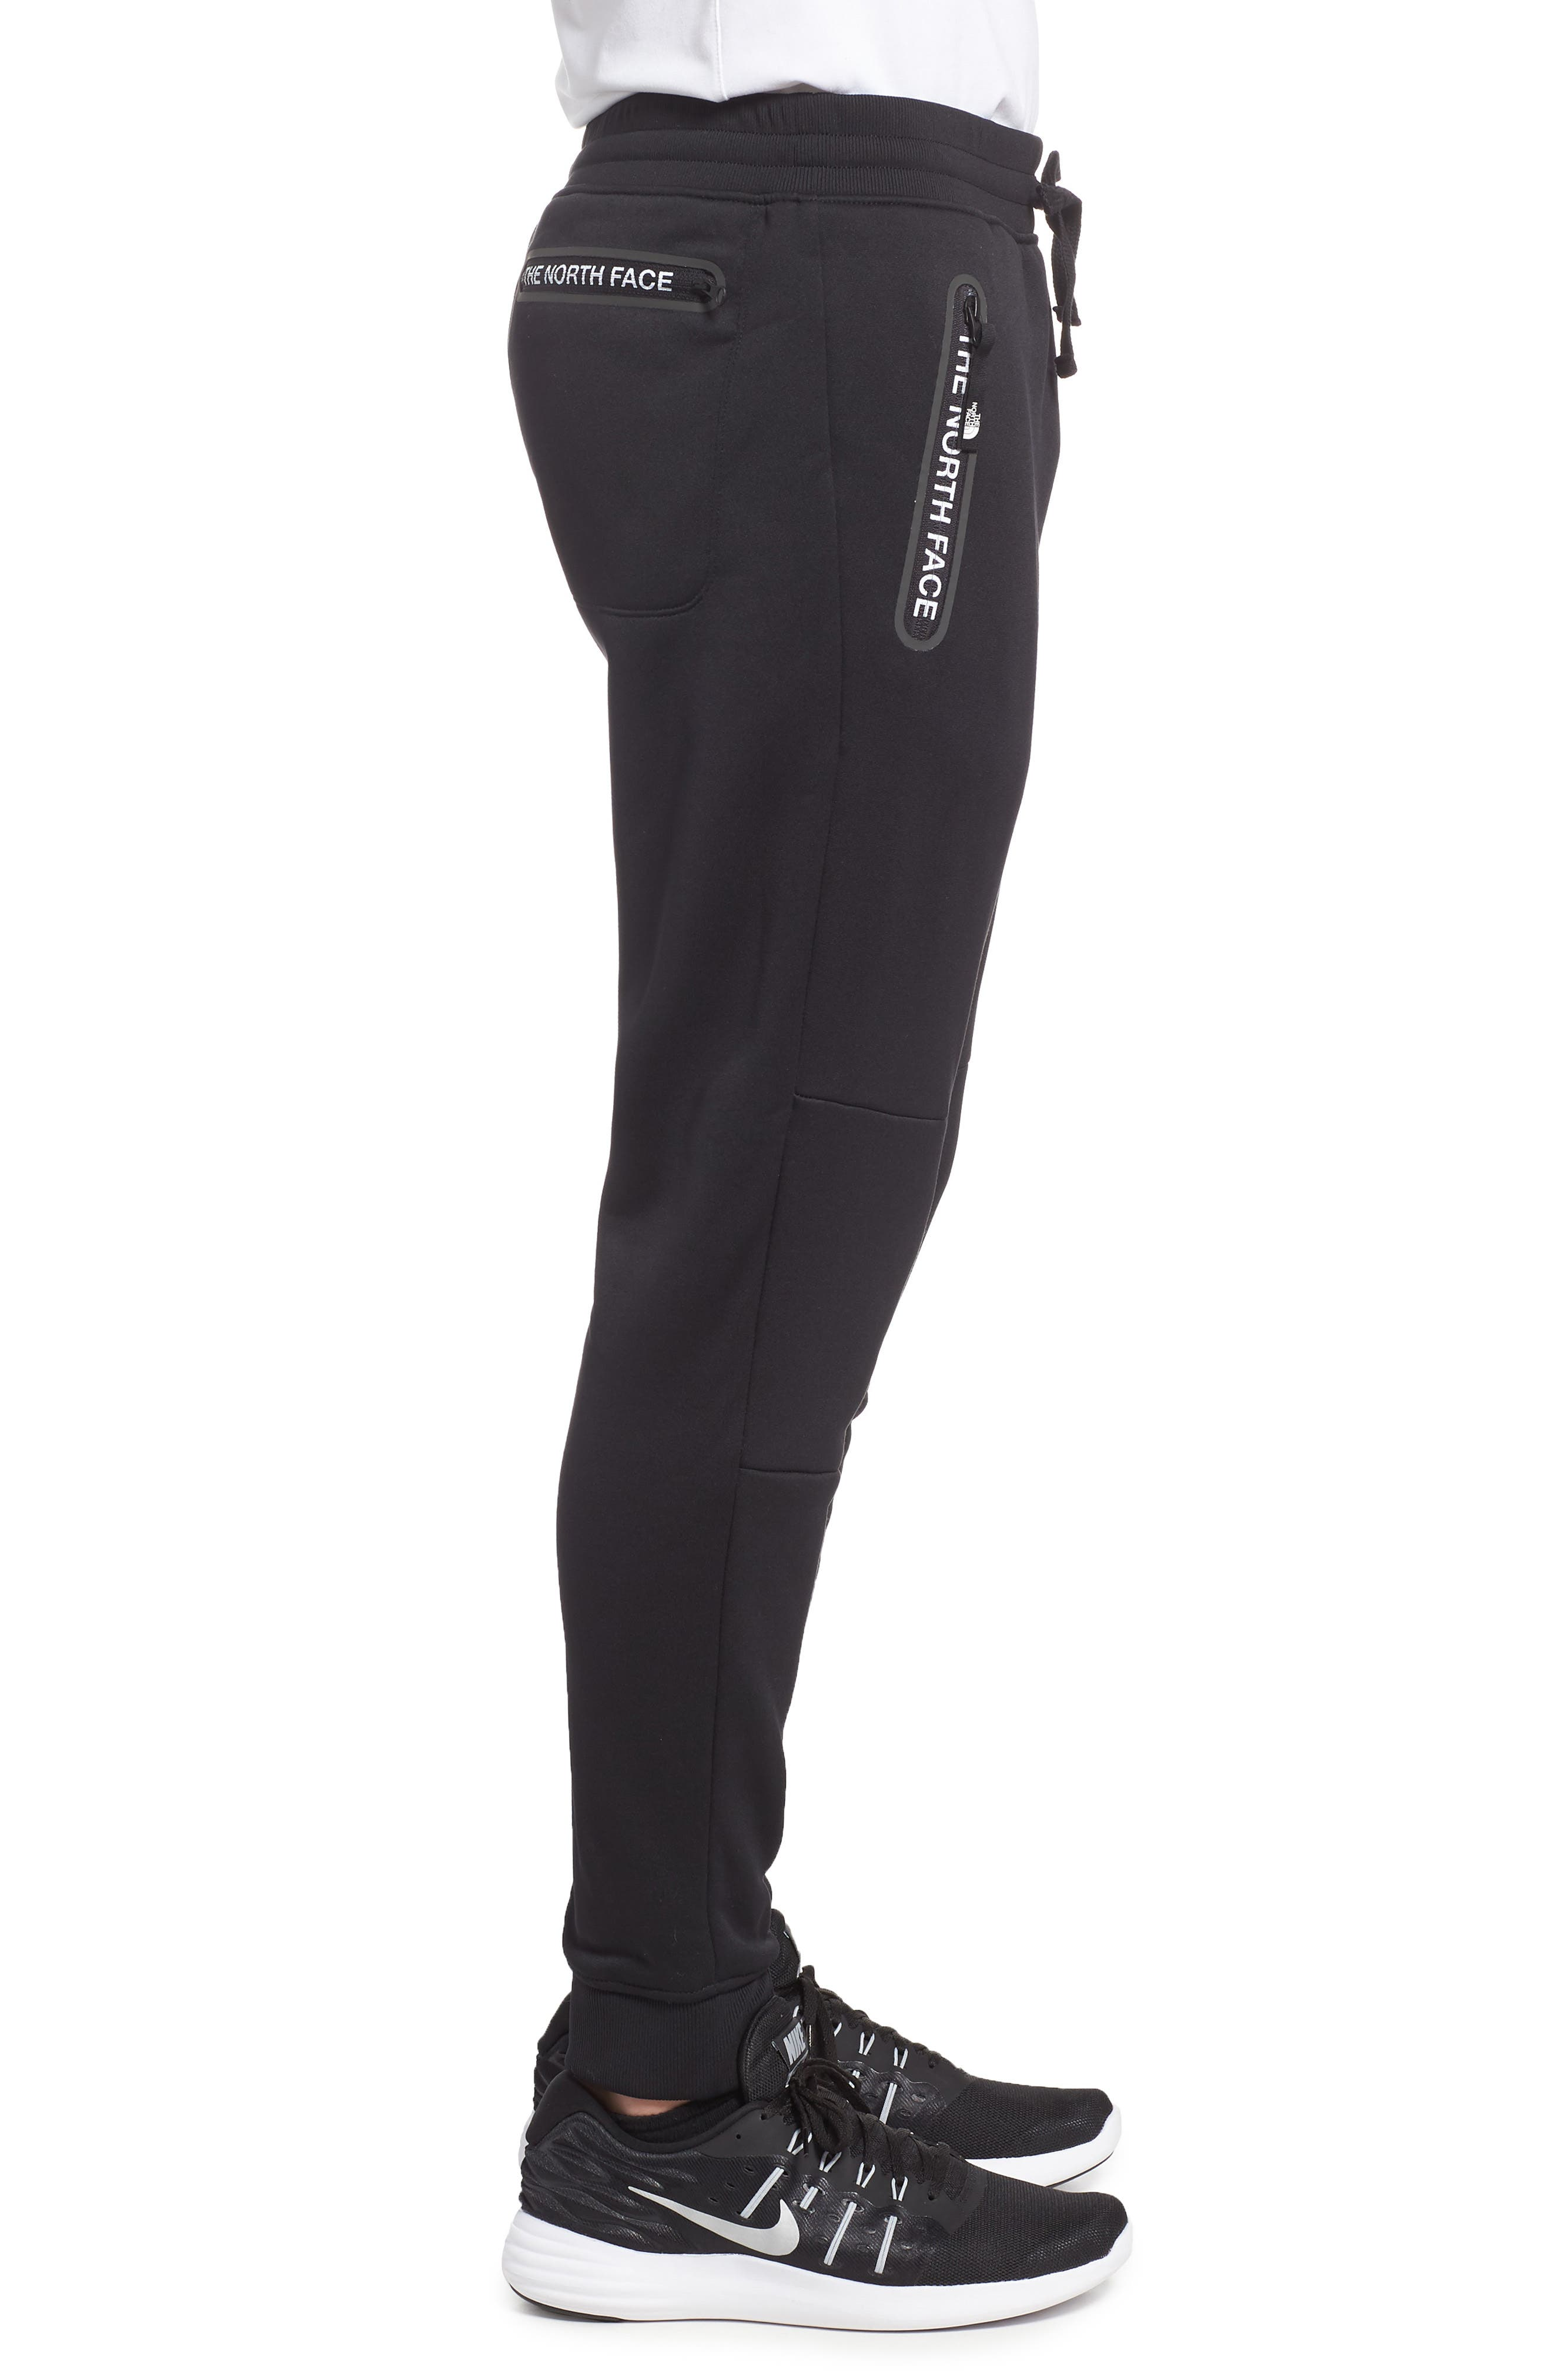 Mount Modern Jogger Pants,                             Alternate thumbnail 3, color,                             Tnf Black